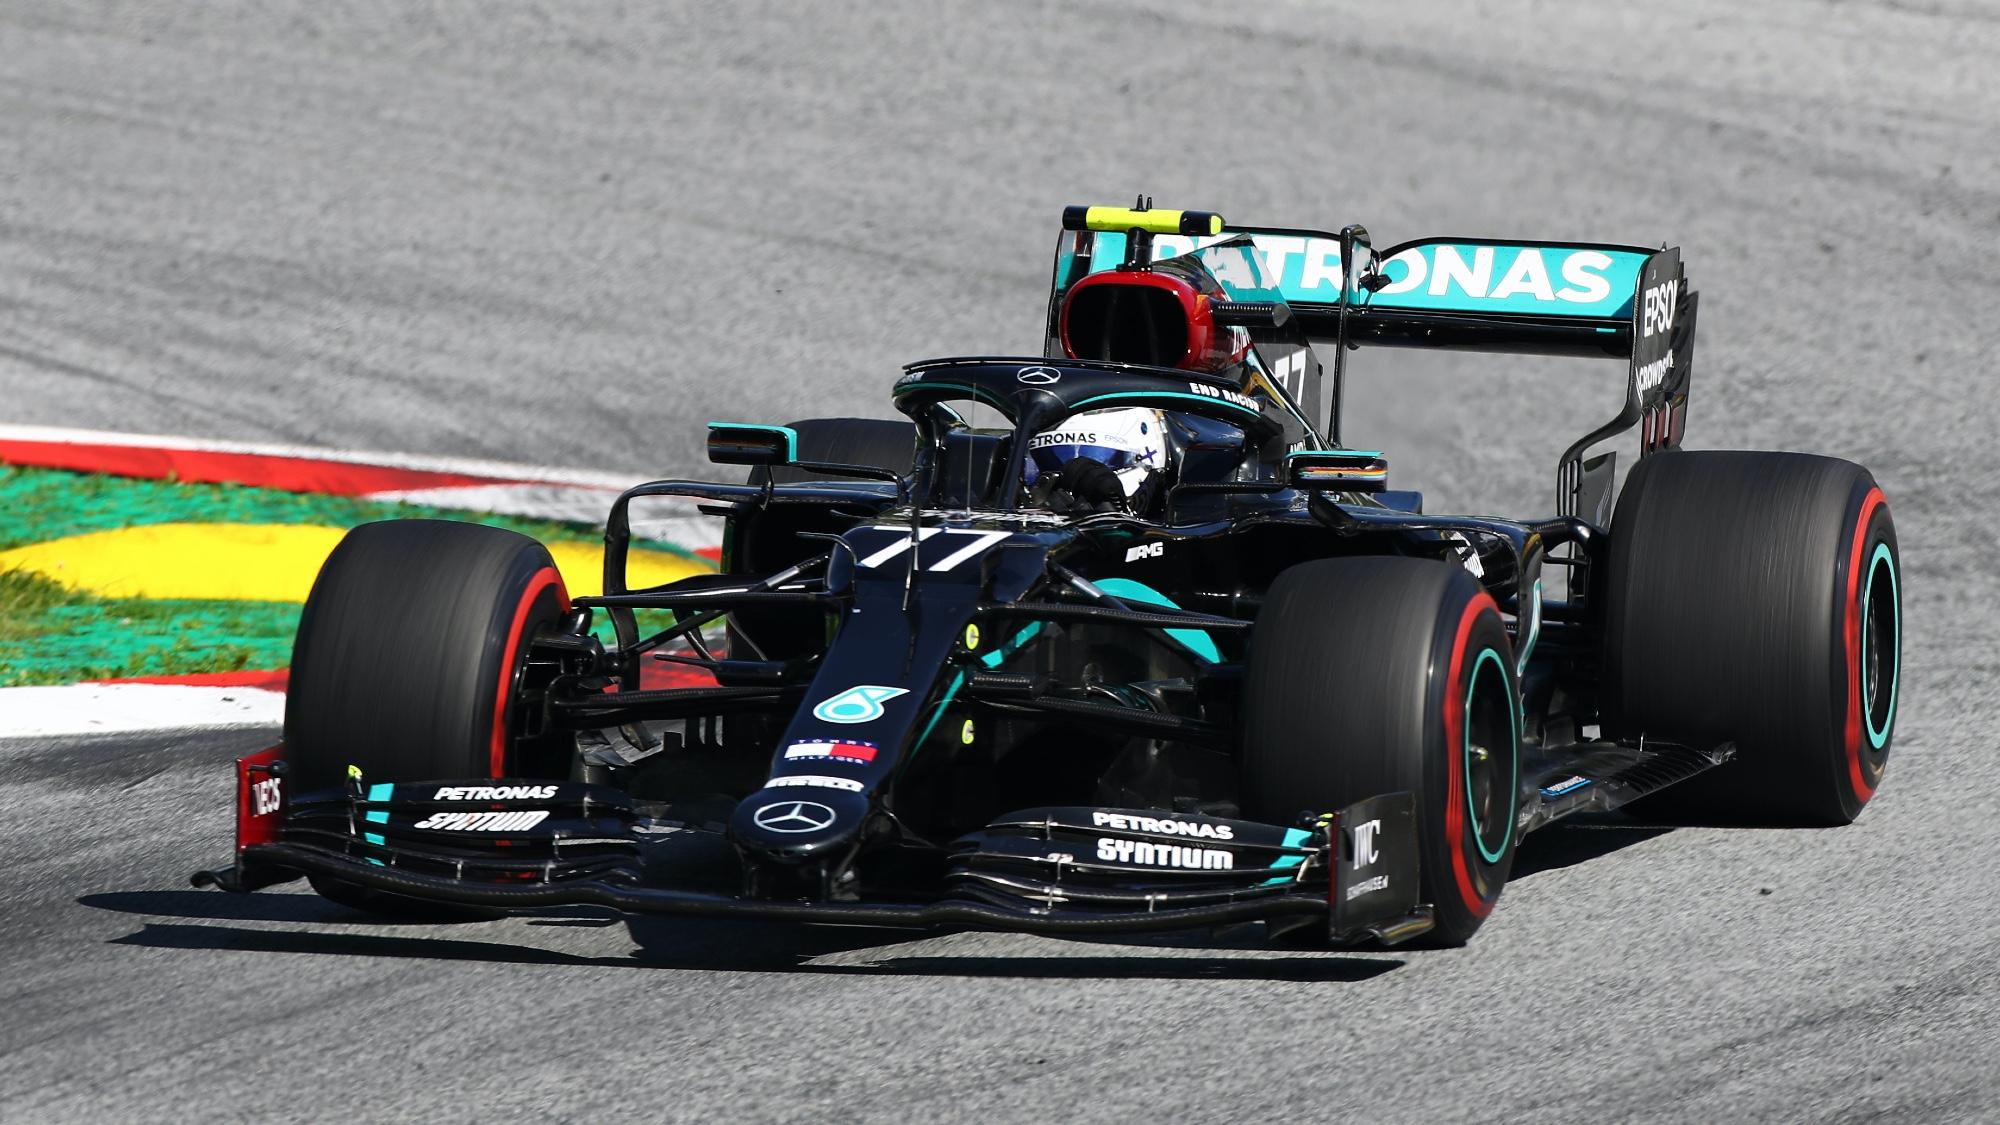 Valtteri Bottas, 2020 Austrian Grand Prix